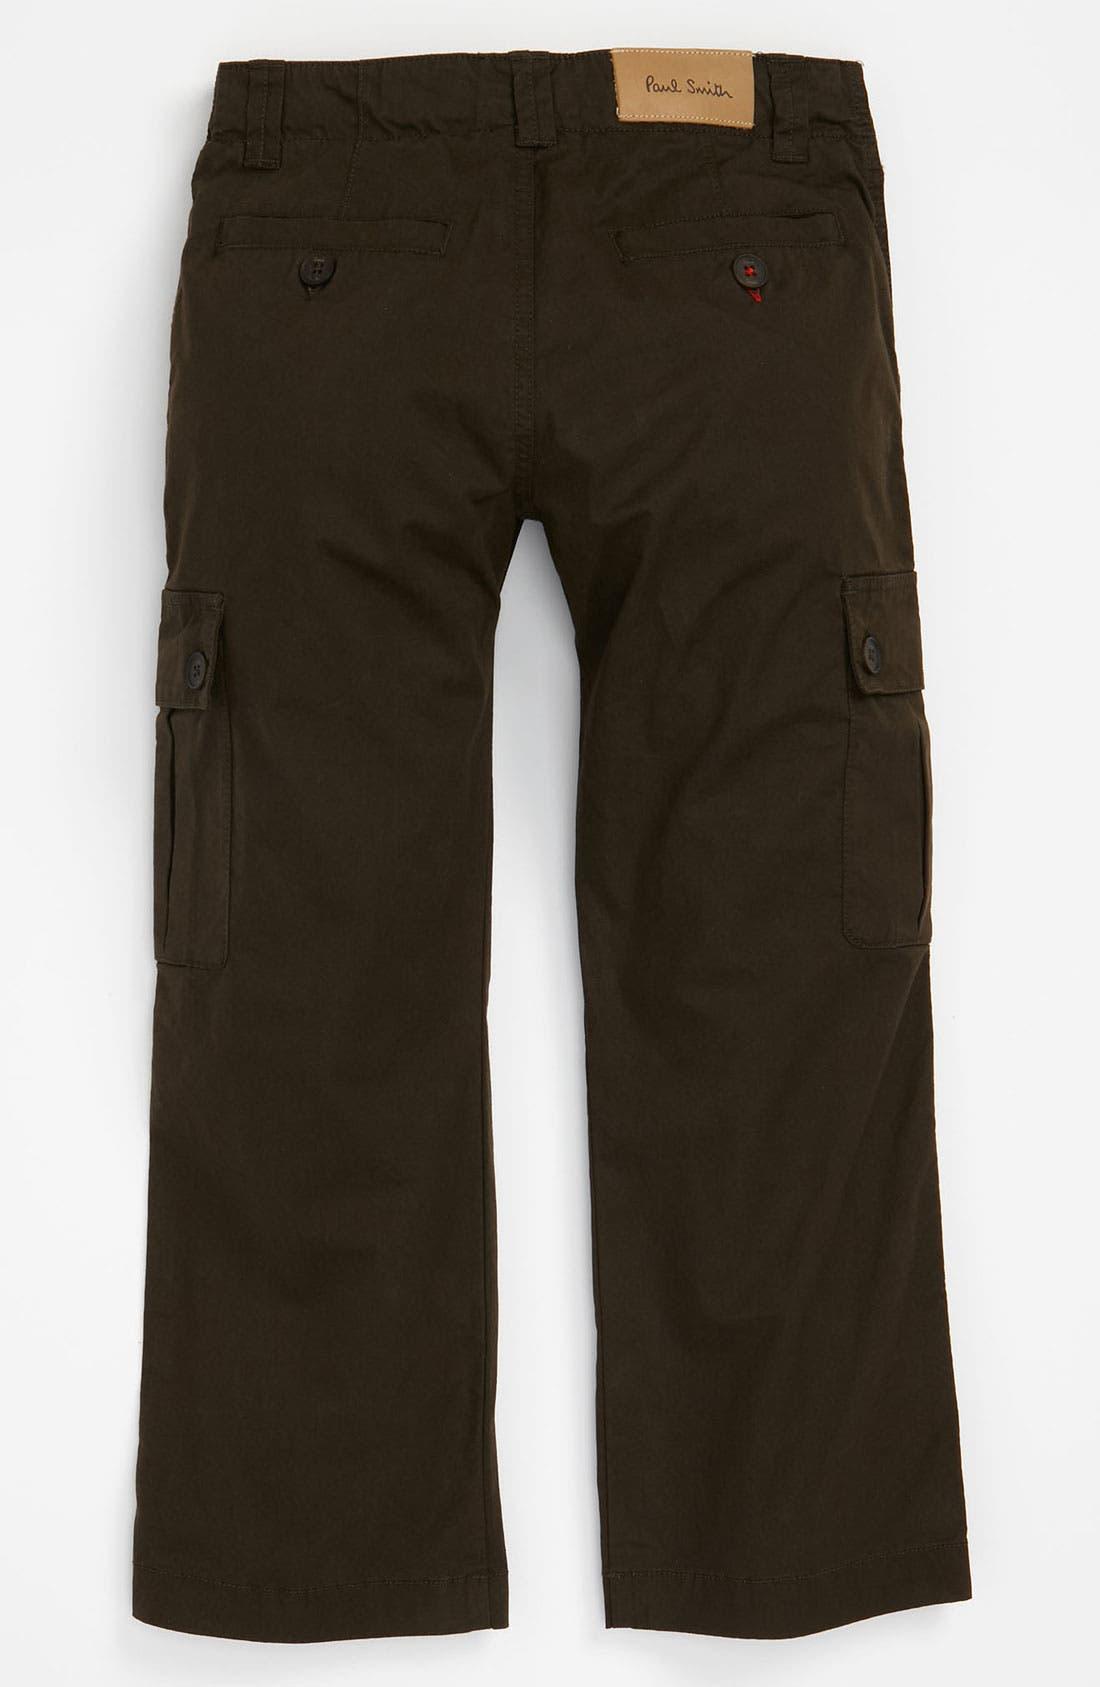 Main Image - Paul Smith Junior 'Calisto' Cargo Pants (Little Boys)